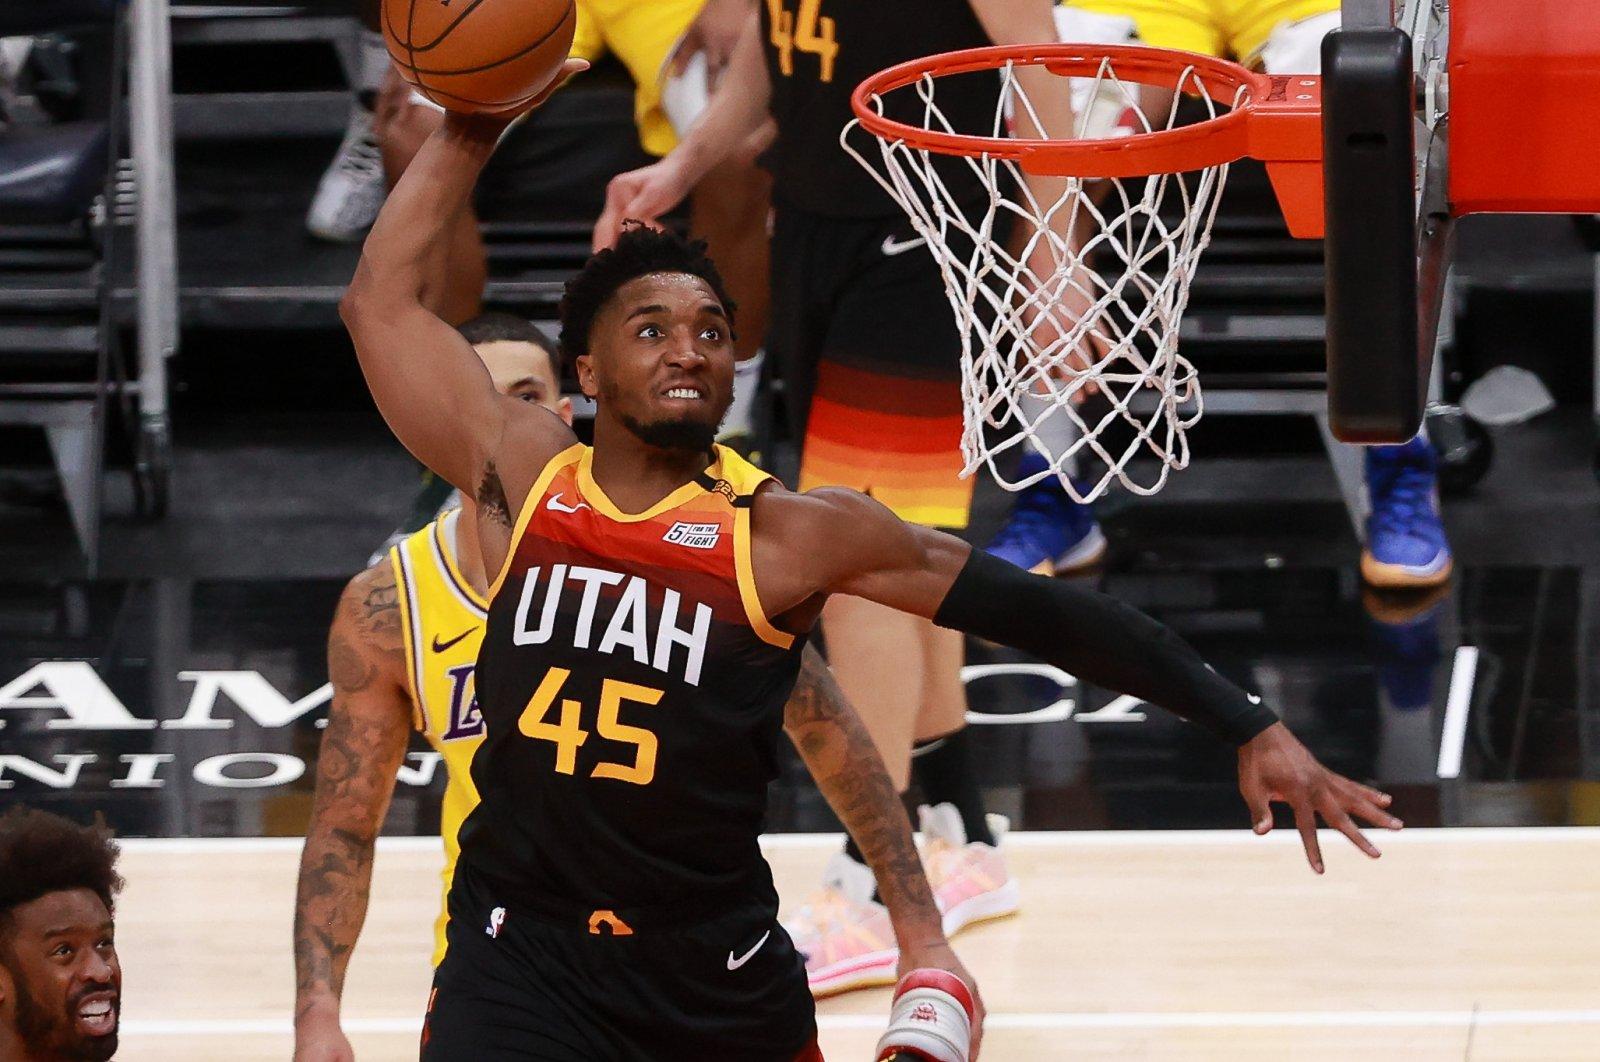 Utah Jazz guard Donovan Mitchell (45) dunks during an NBA match against the Los Angeles Lakers at Vivint Smart Home Arena, Salt Lake City, Utah, Feb 24, 2021. (Reuters Photo)